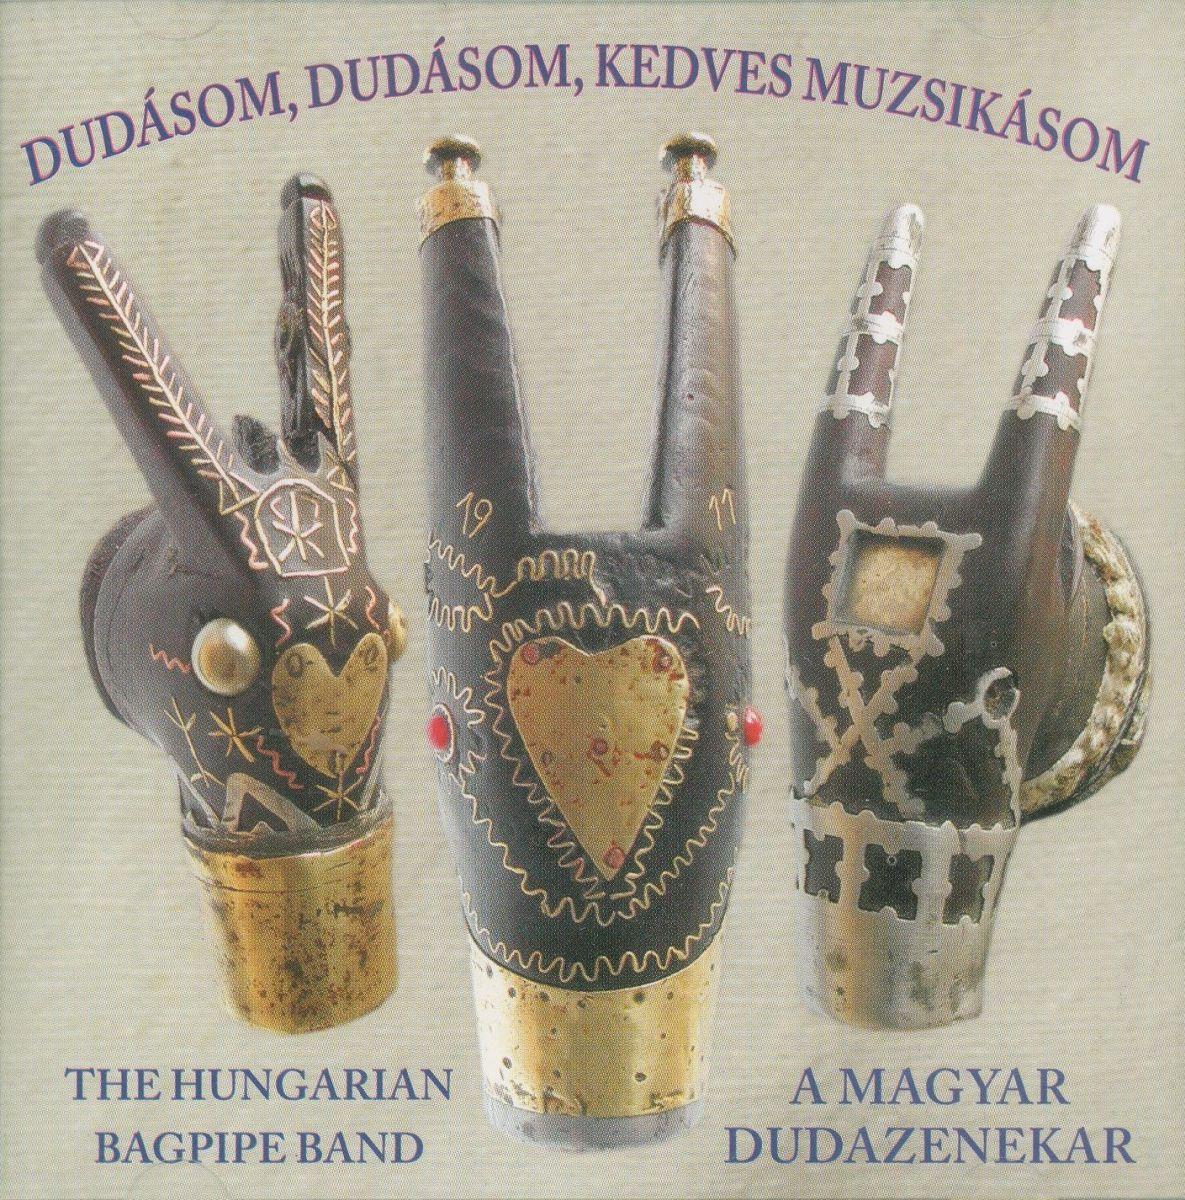 A Magyar Dudazenekar